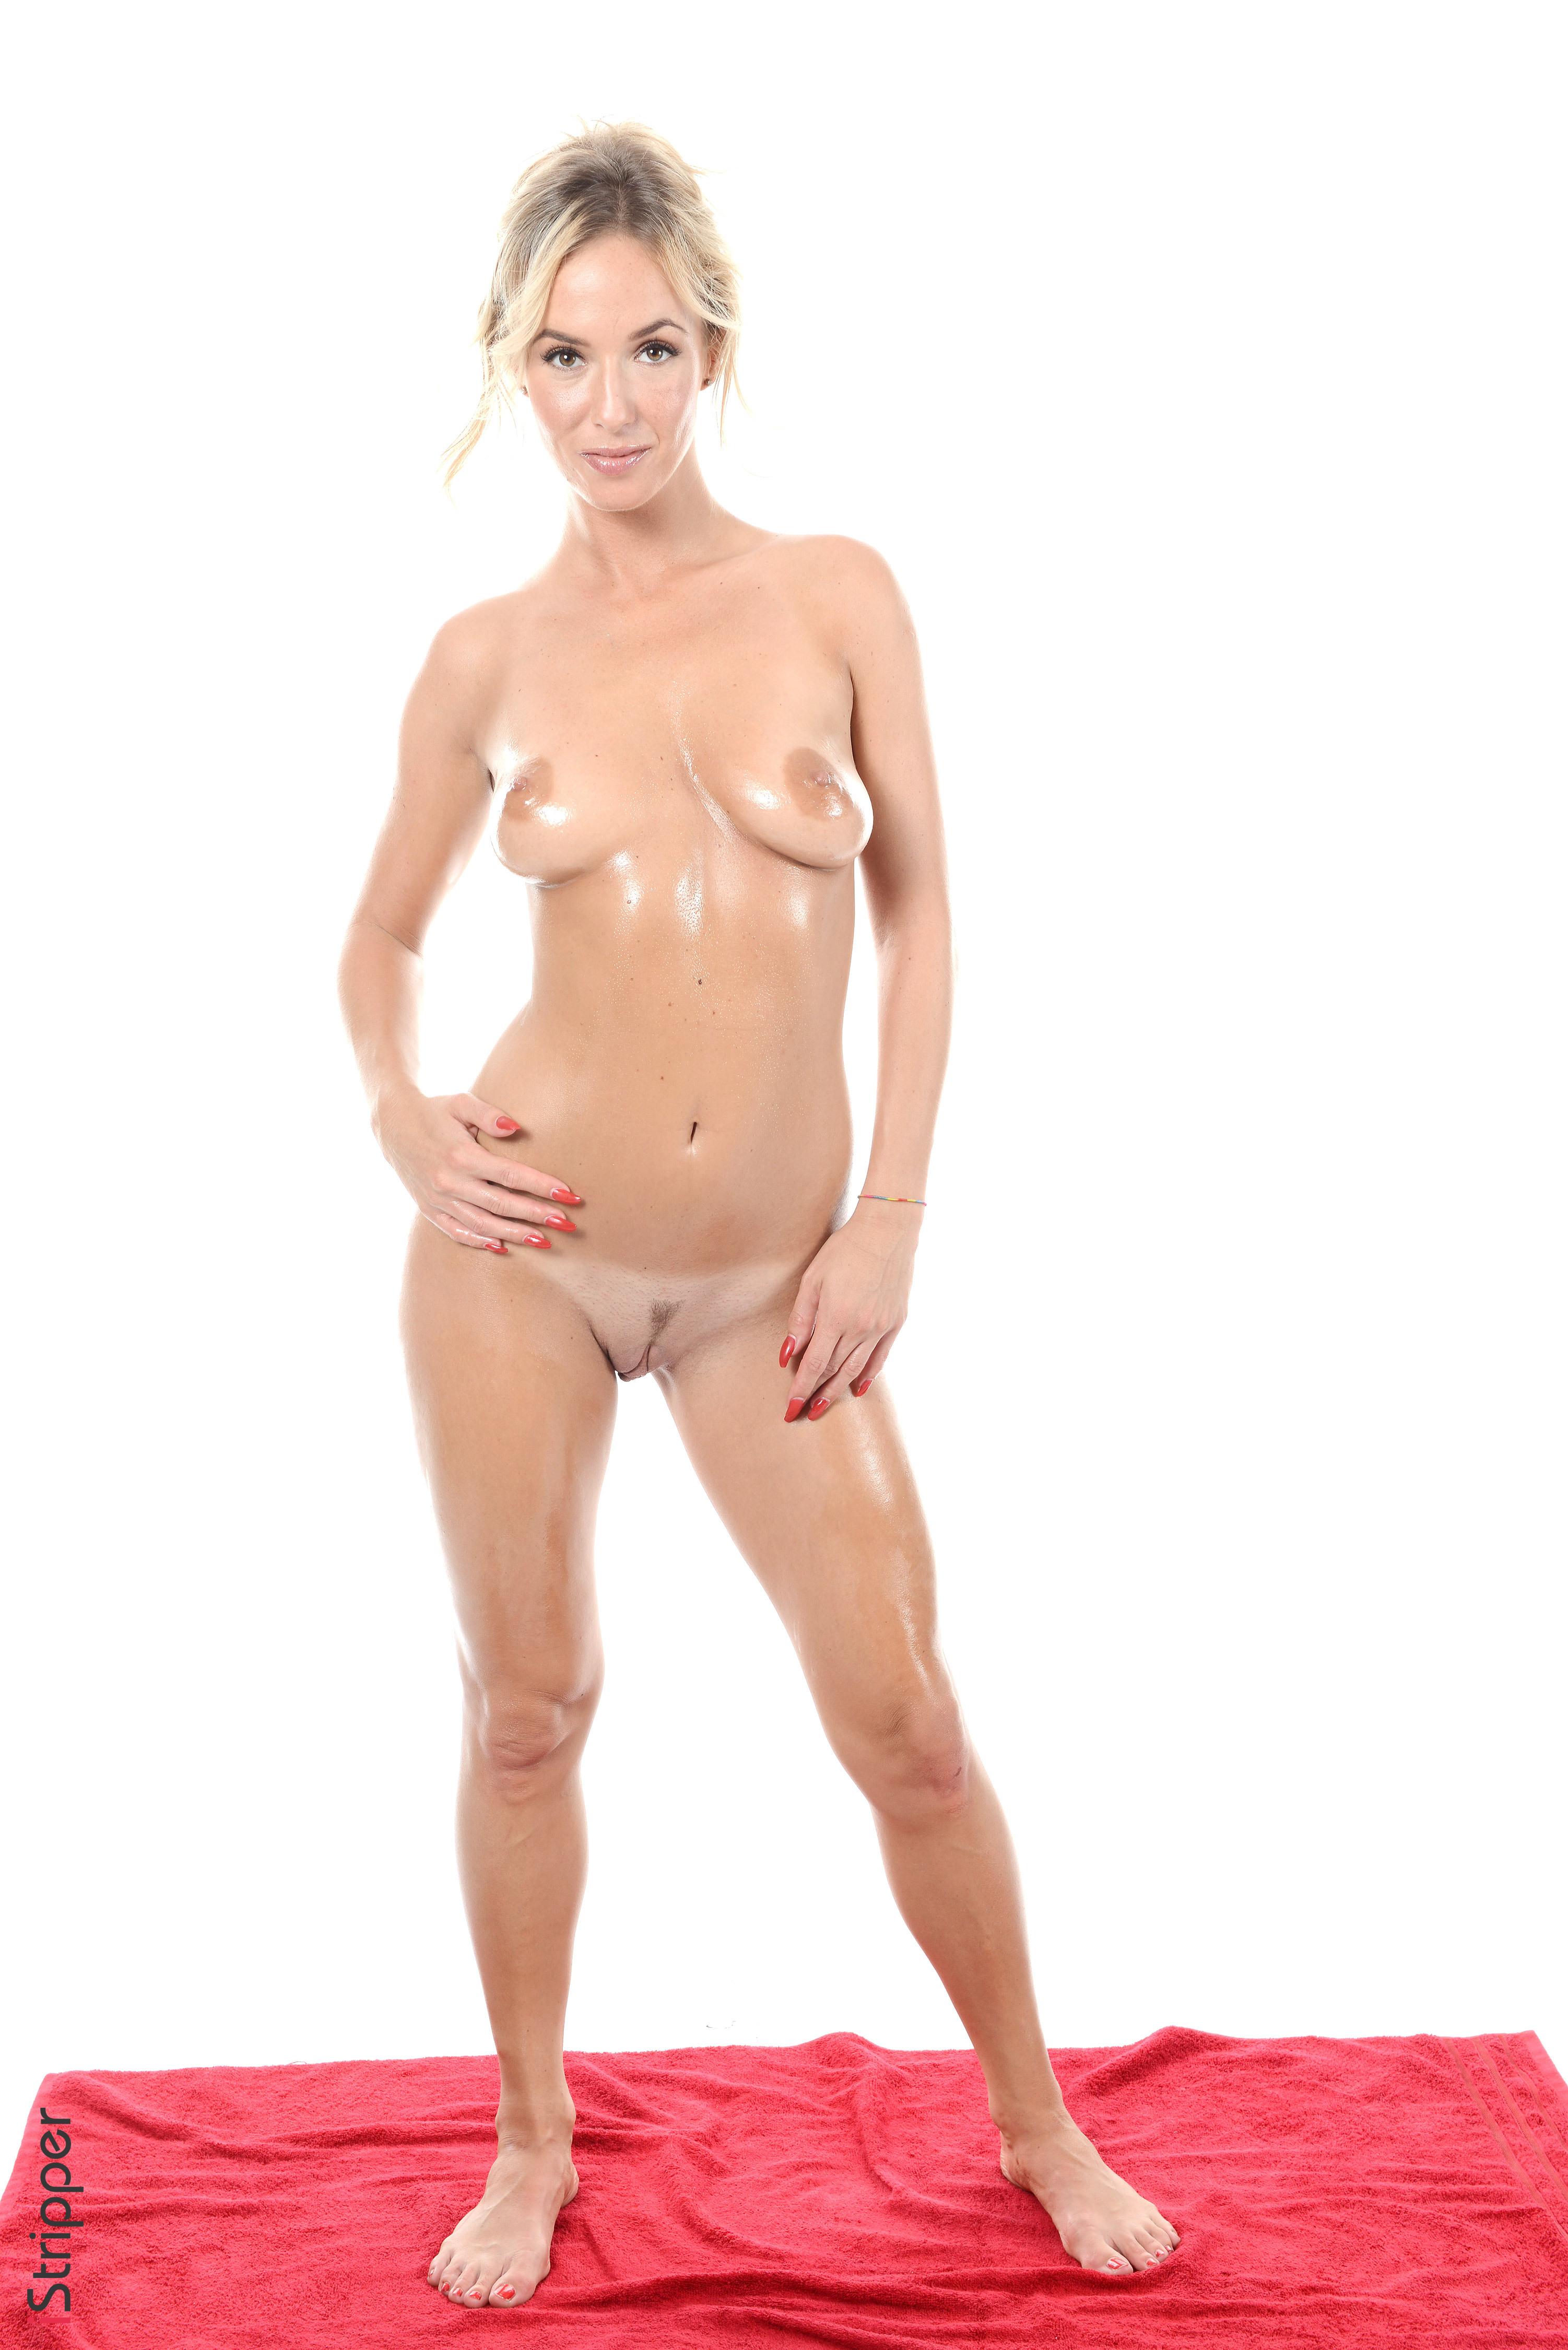 free videos girls stripping